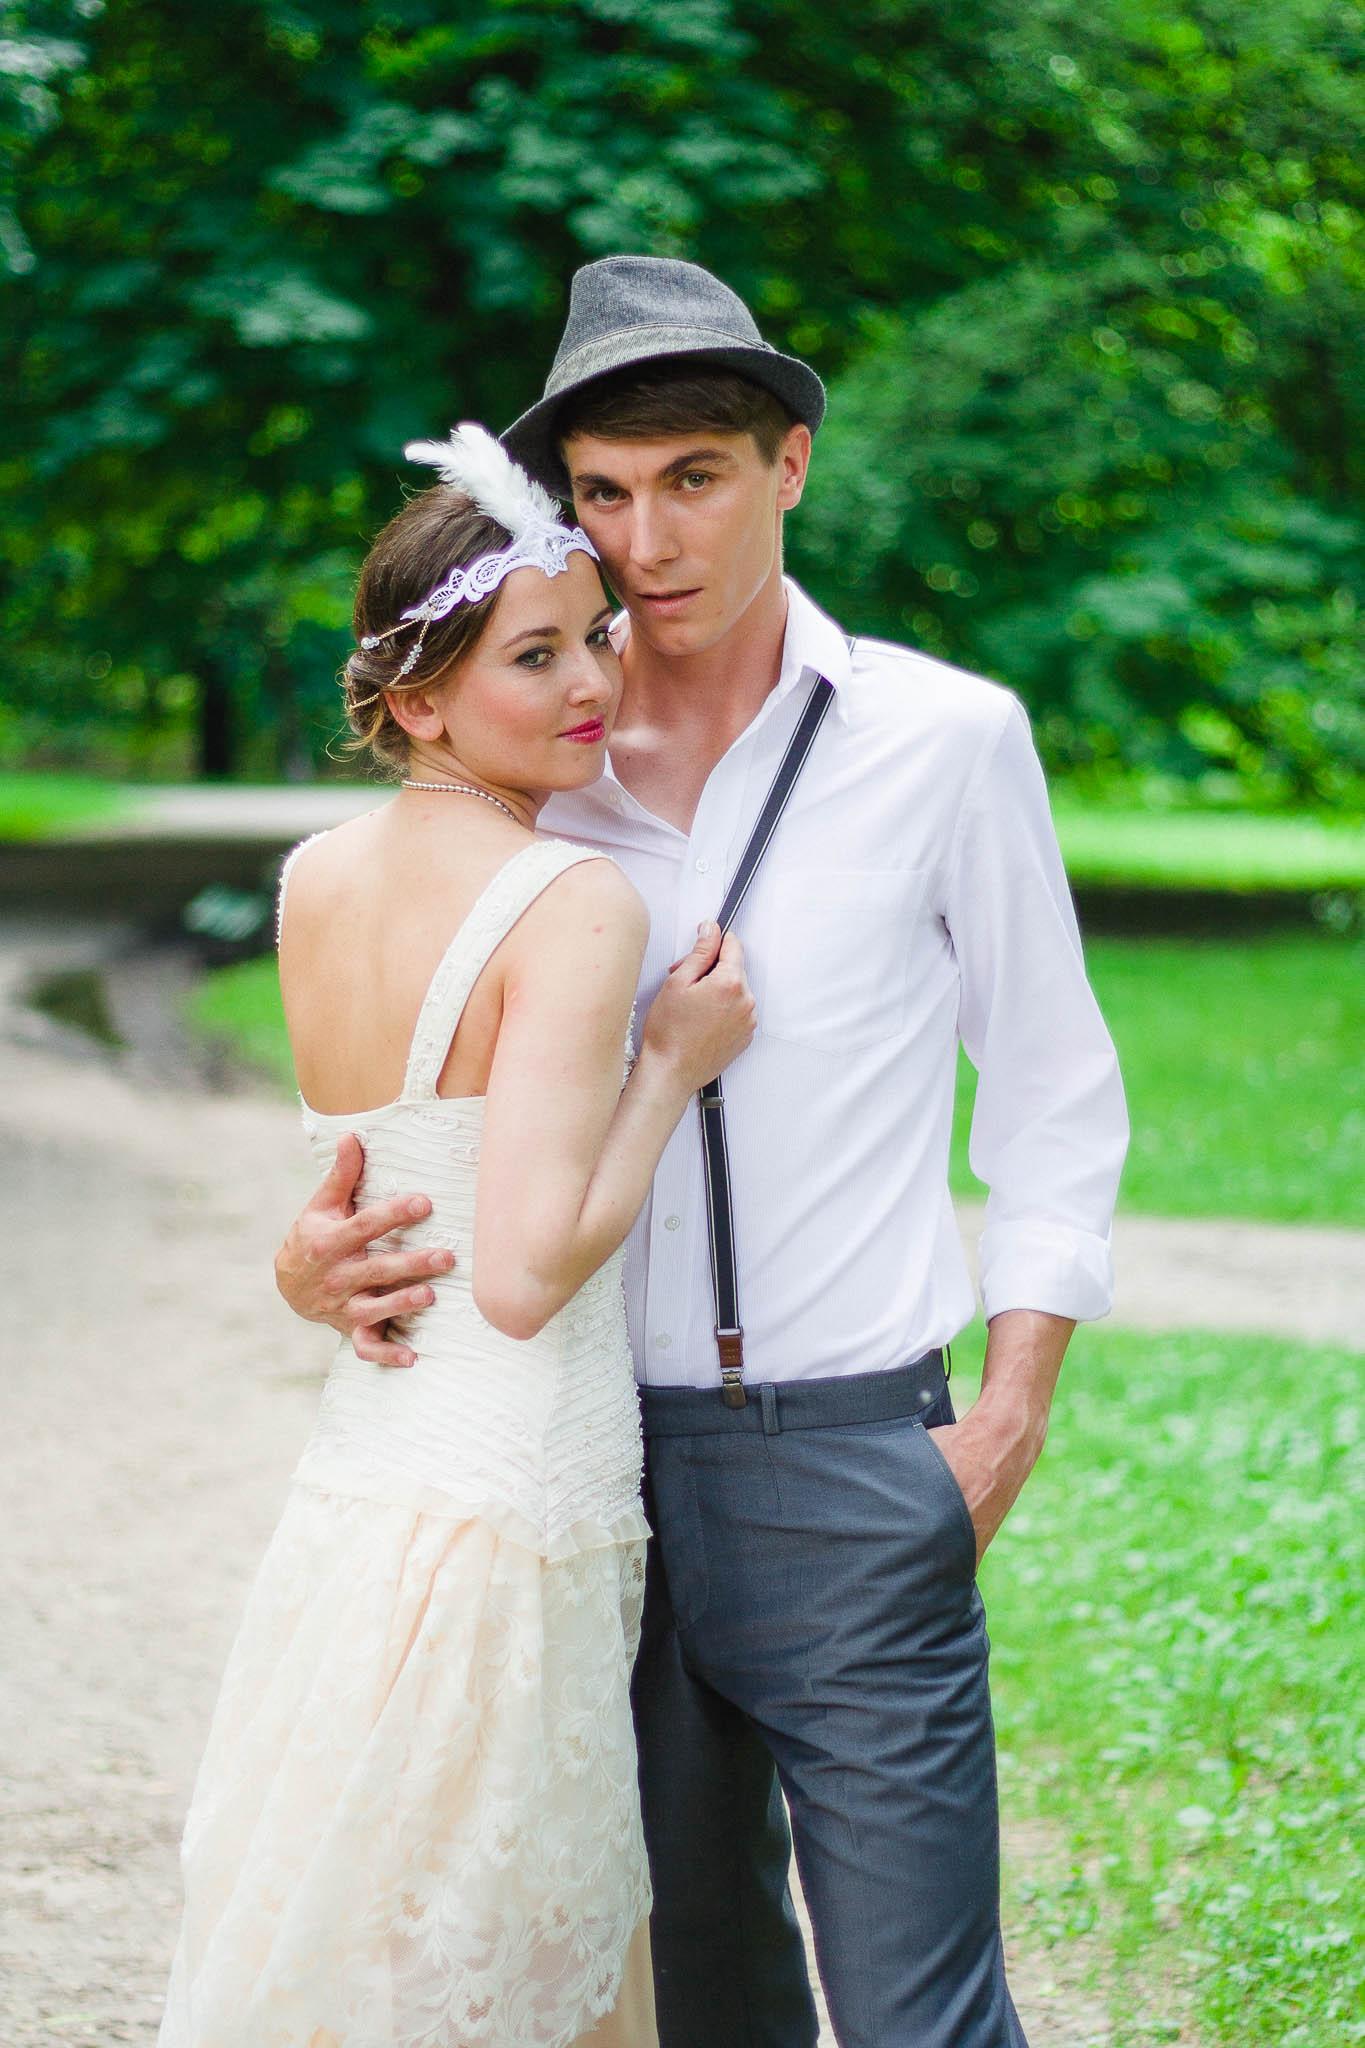 Sesja ślubna stylizowana na lata 20